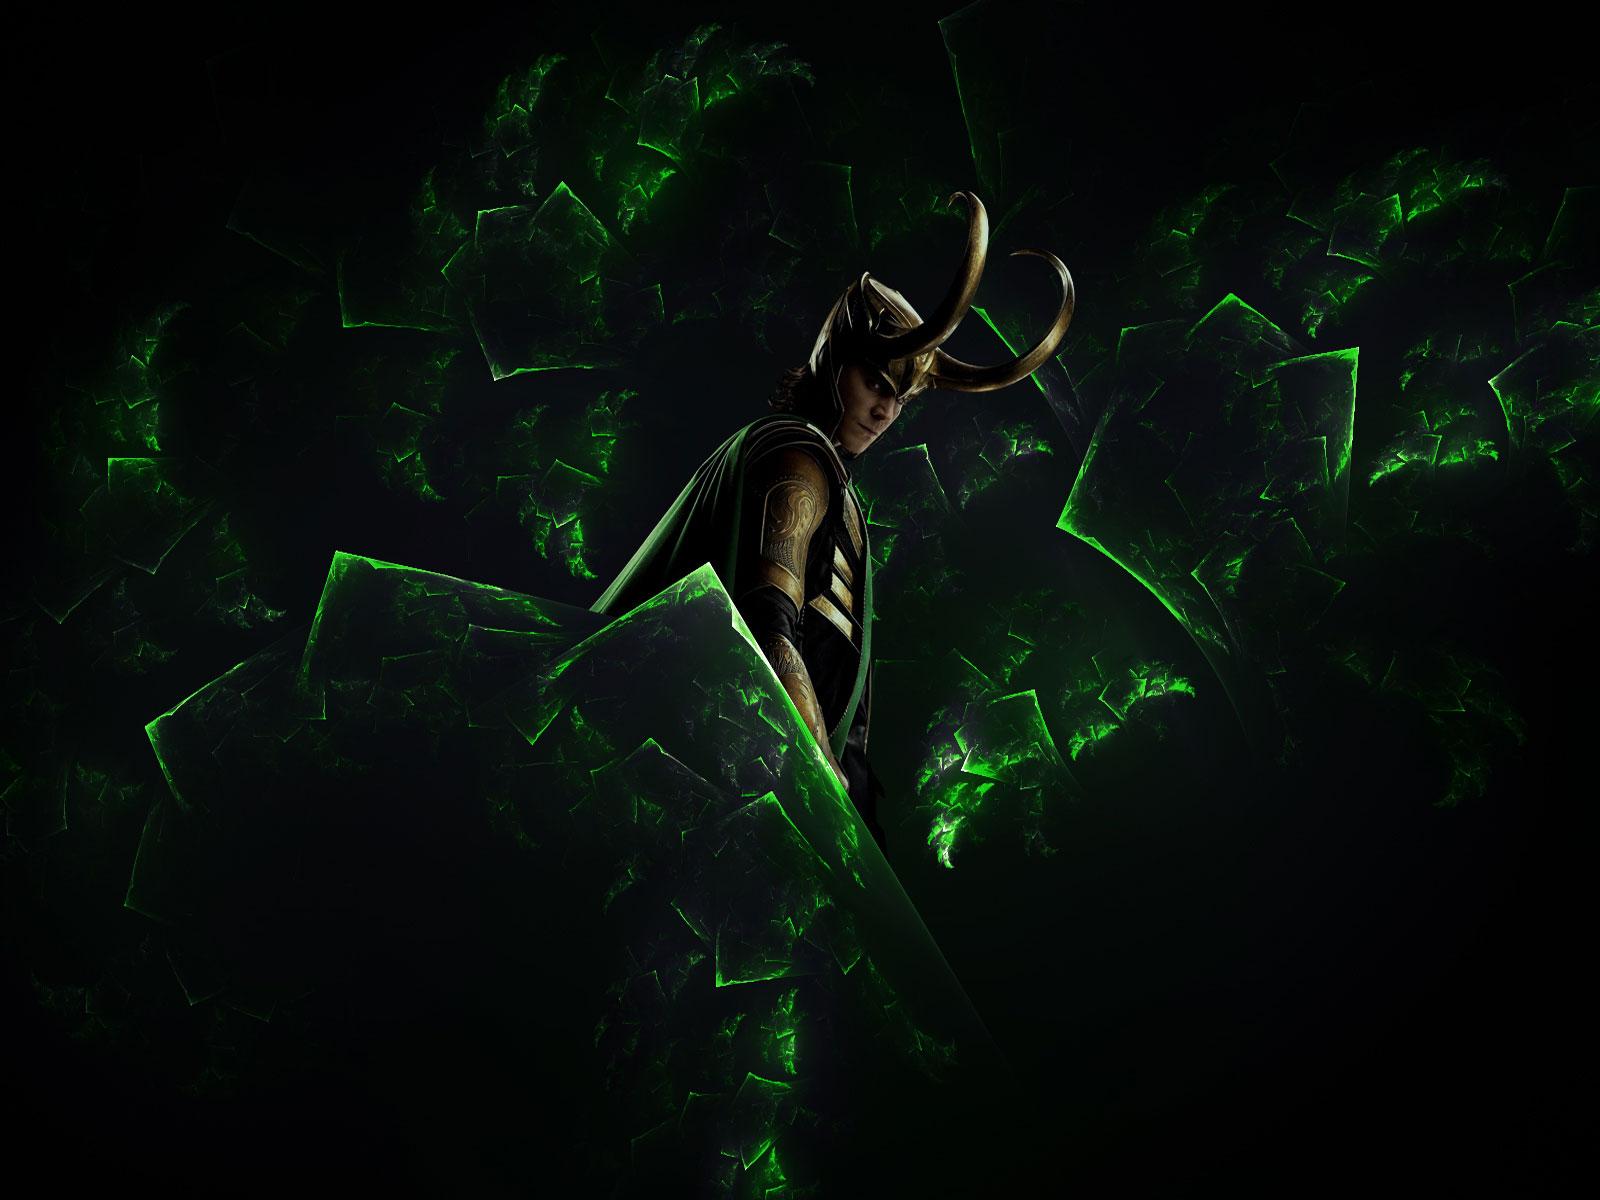 Loki background image Loki wallpapers 1600x1200